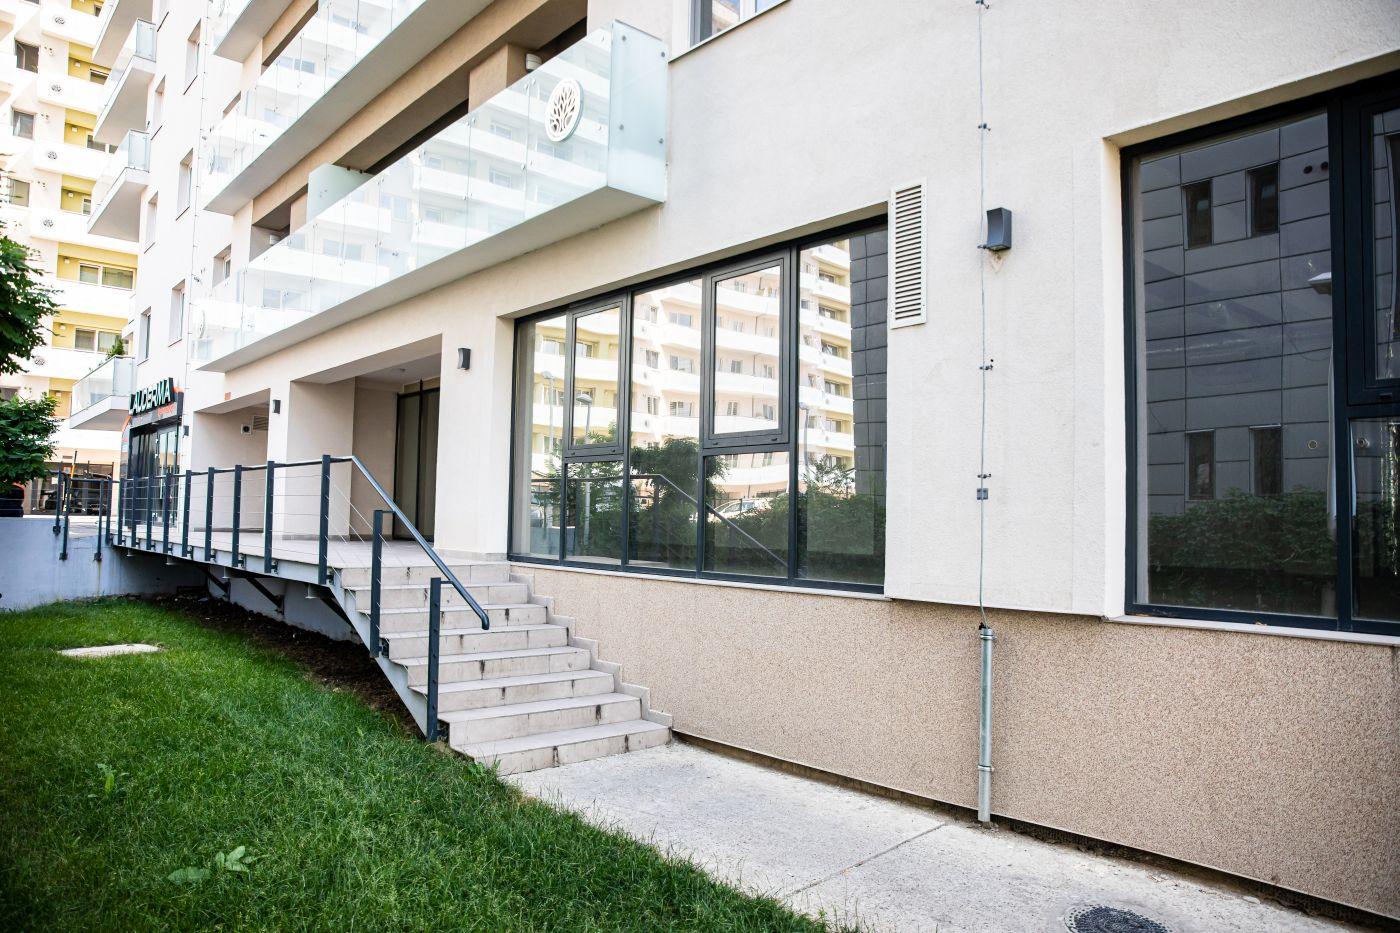 conest-grand-residence-spatii-comerciale-de-inchiriat-iasi-cgr-10